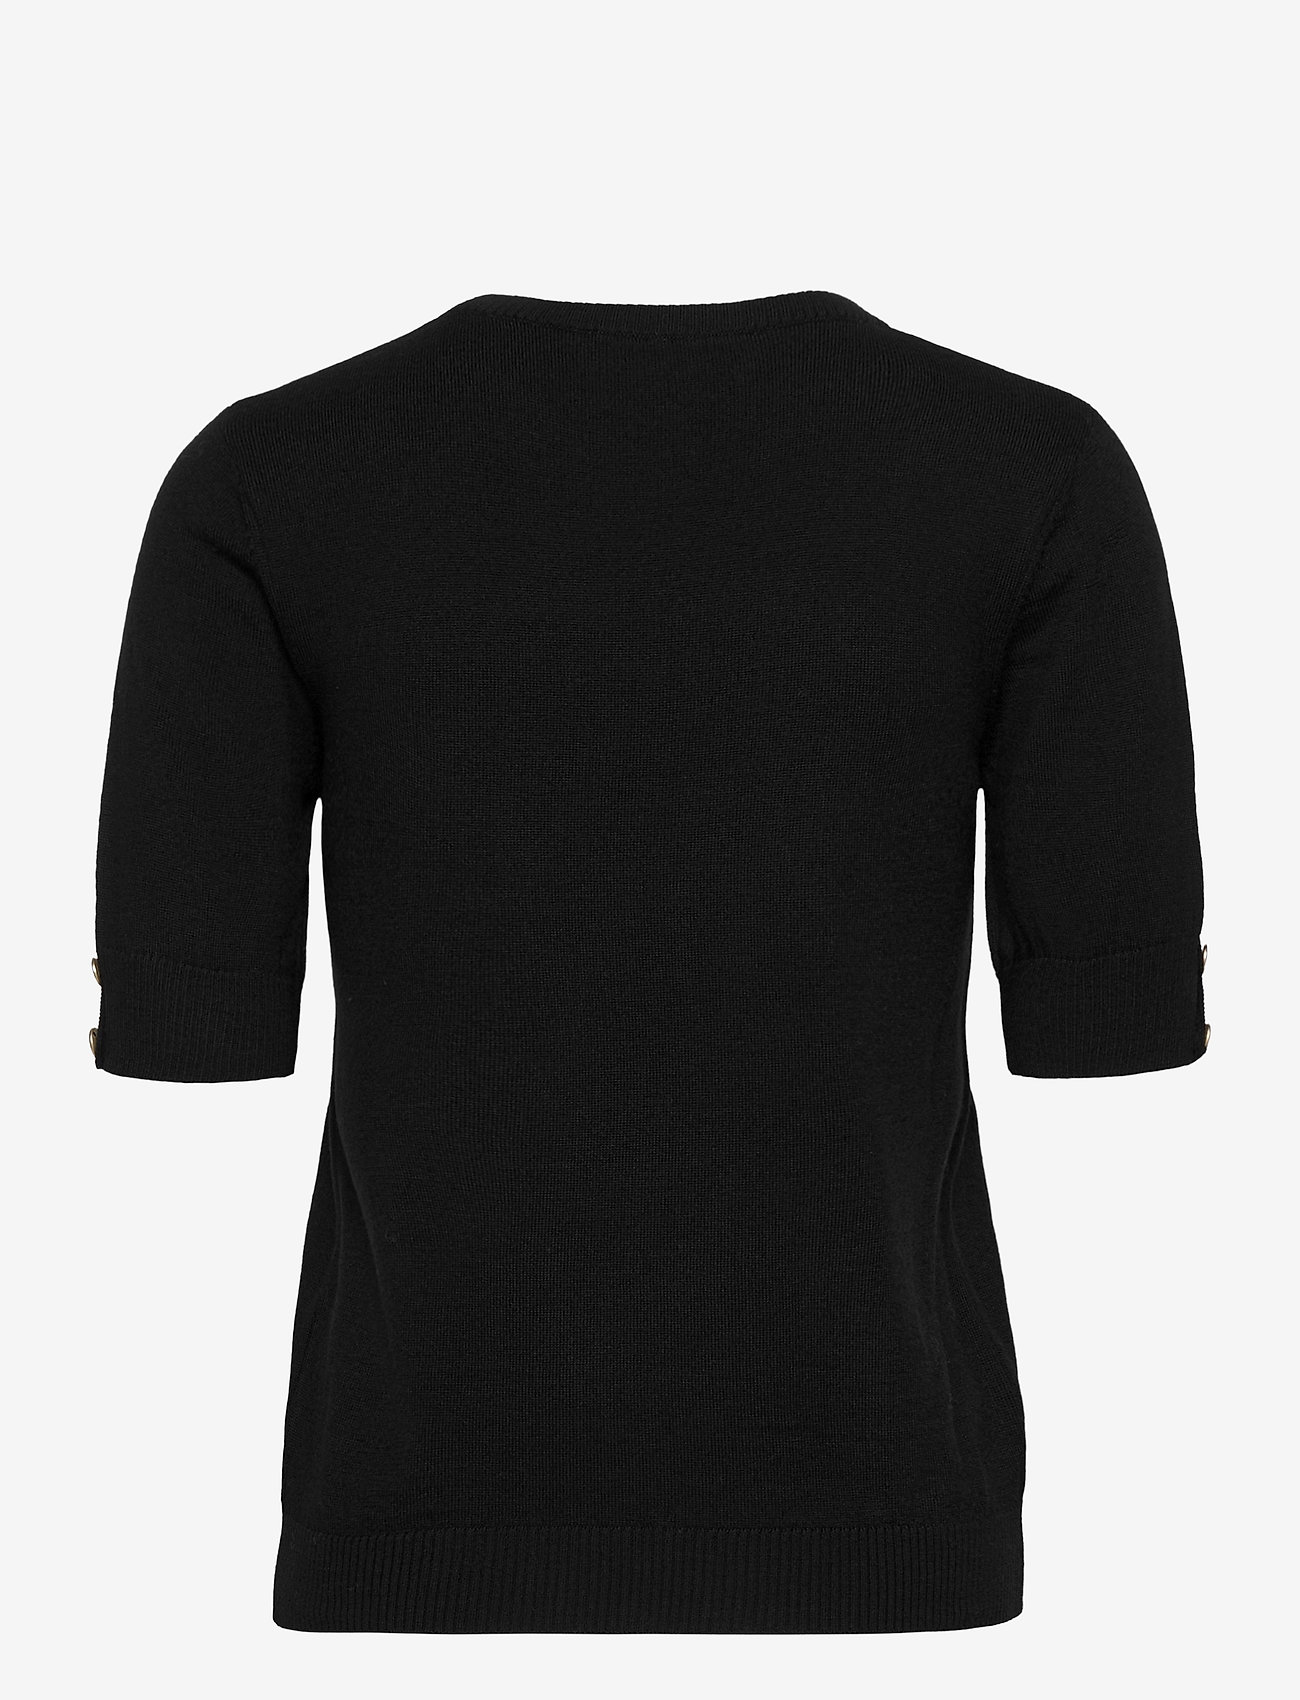 Lucca Top (Black) (189 €) - BUSNEL Dpnc4